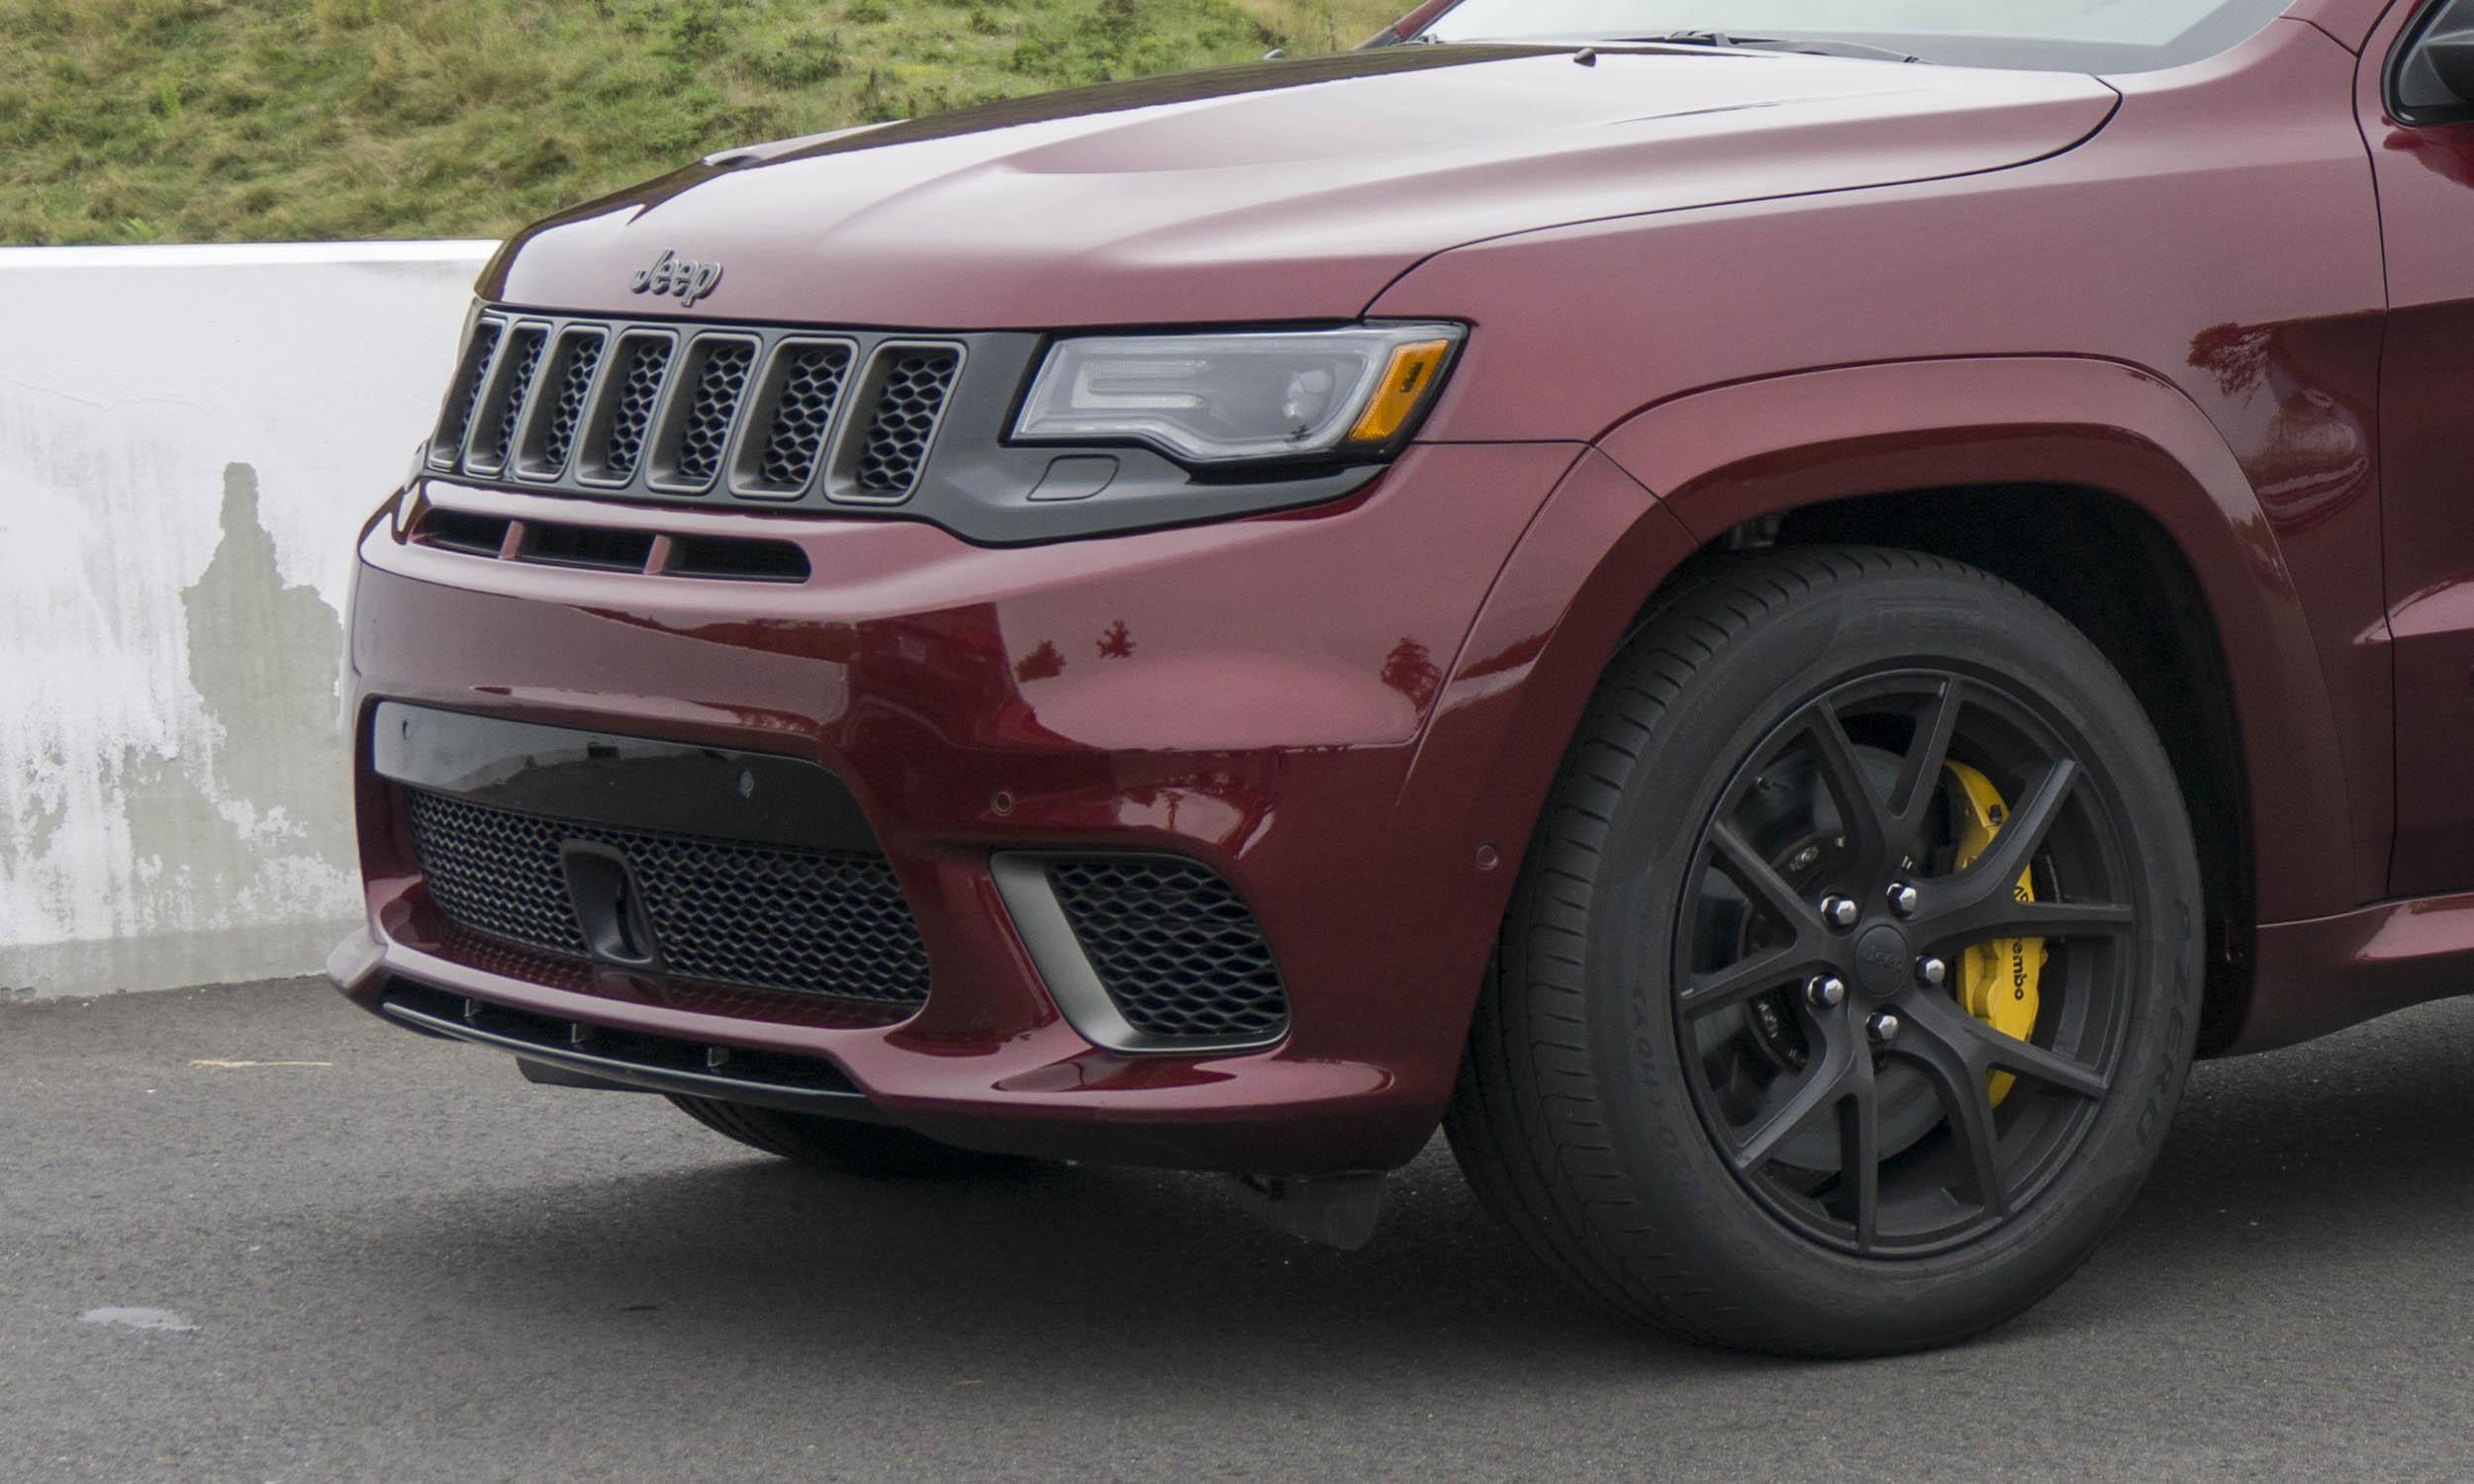 jeep cherokee 2015 ground autos post. Black Bedroom Furniture Sets. Home Design Ideas